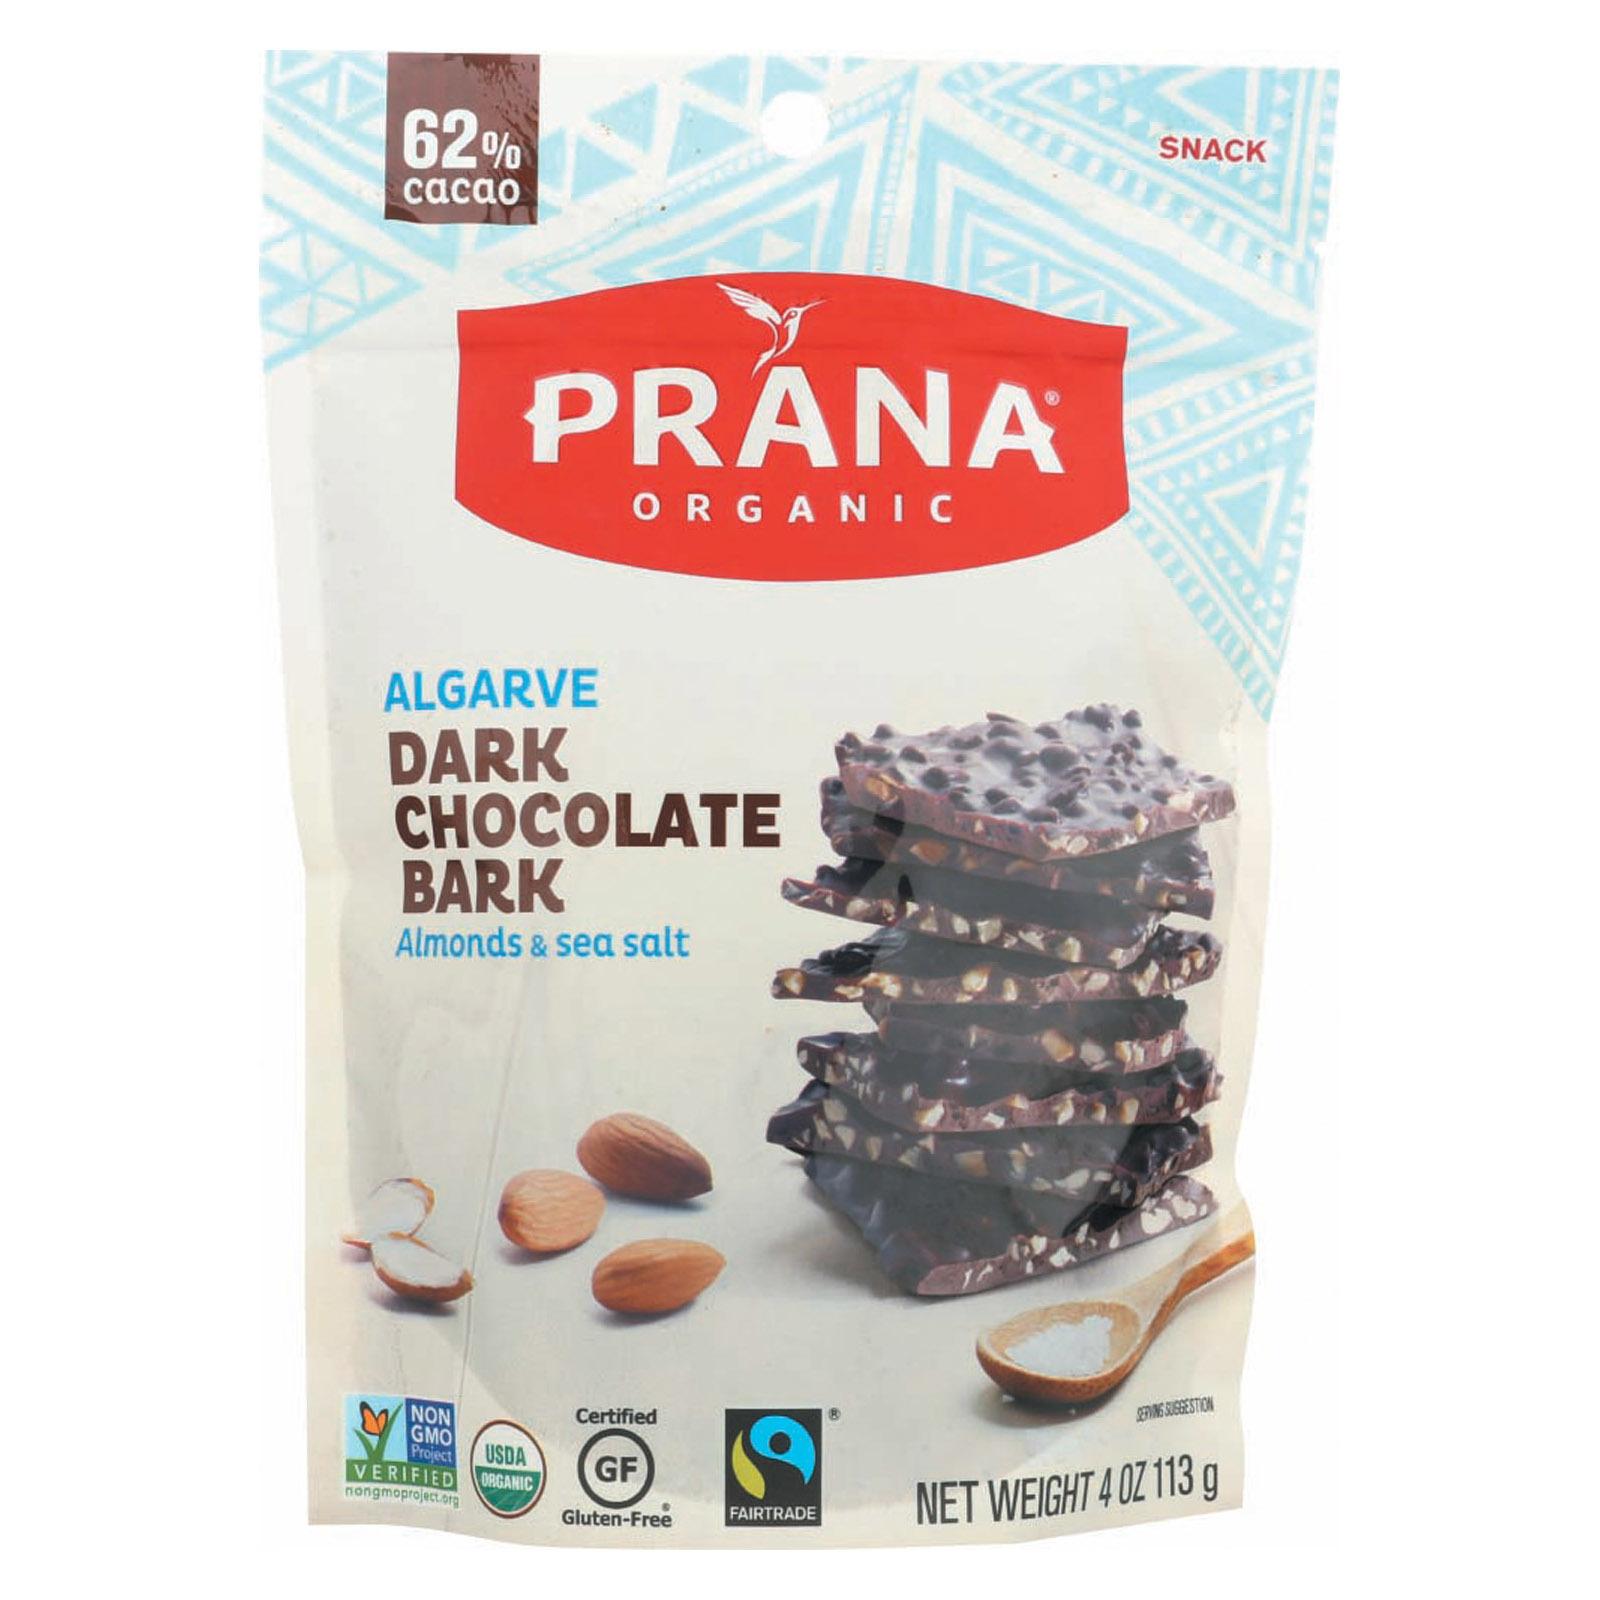 Prana Organics Organic 62% Chocolate Bark - Almonds and Sea Salt - Case of 8 - 4 oz